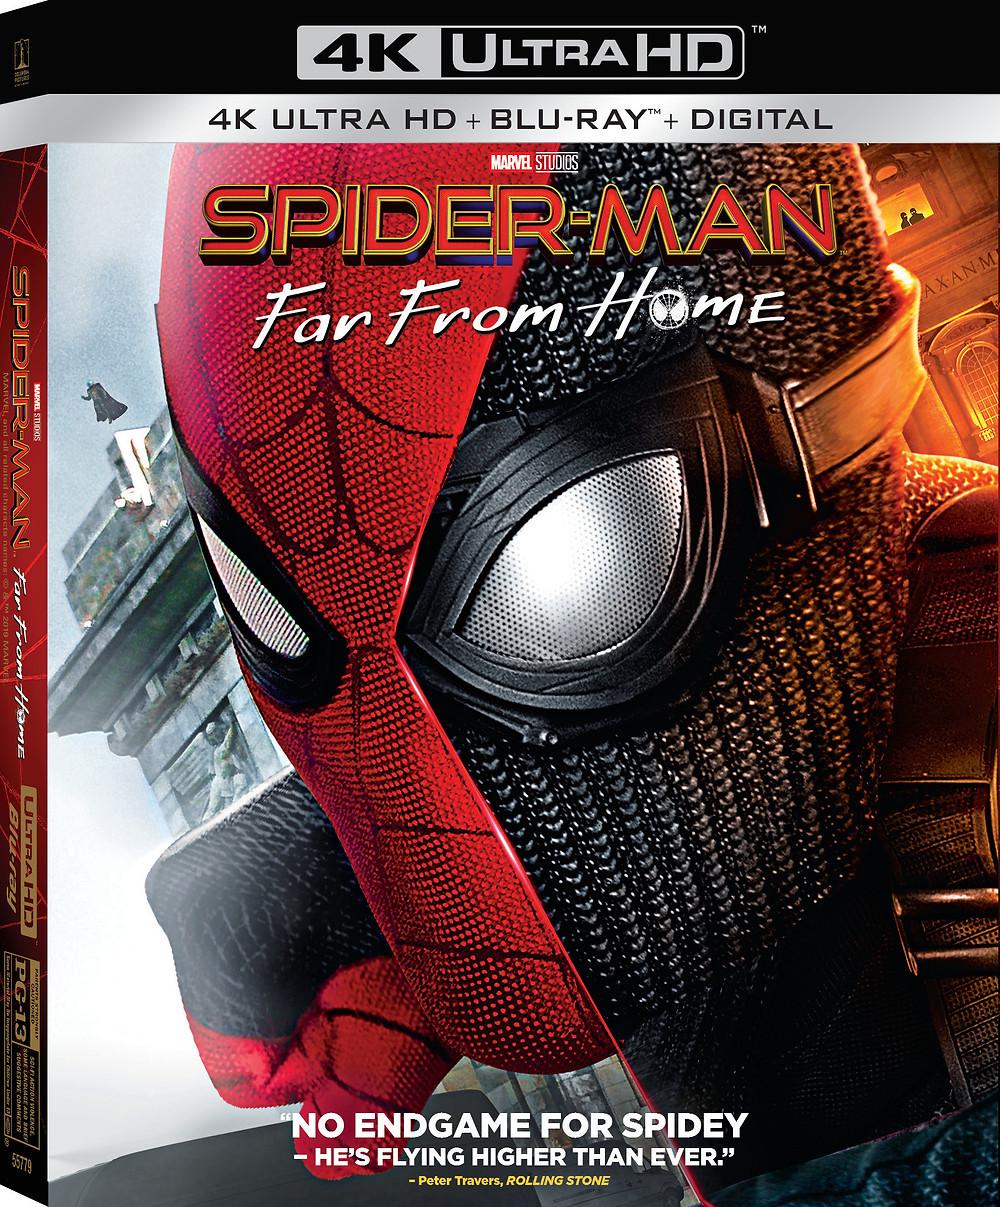 Brad R Lambert Client Bosslogic Spider-Man Far From Home Artwork